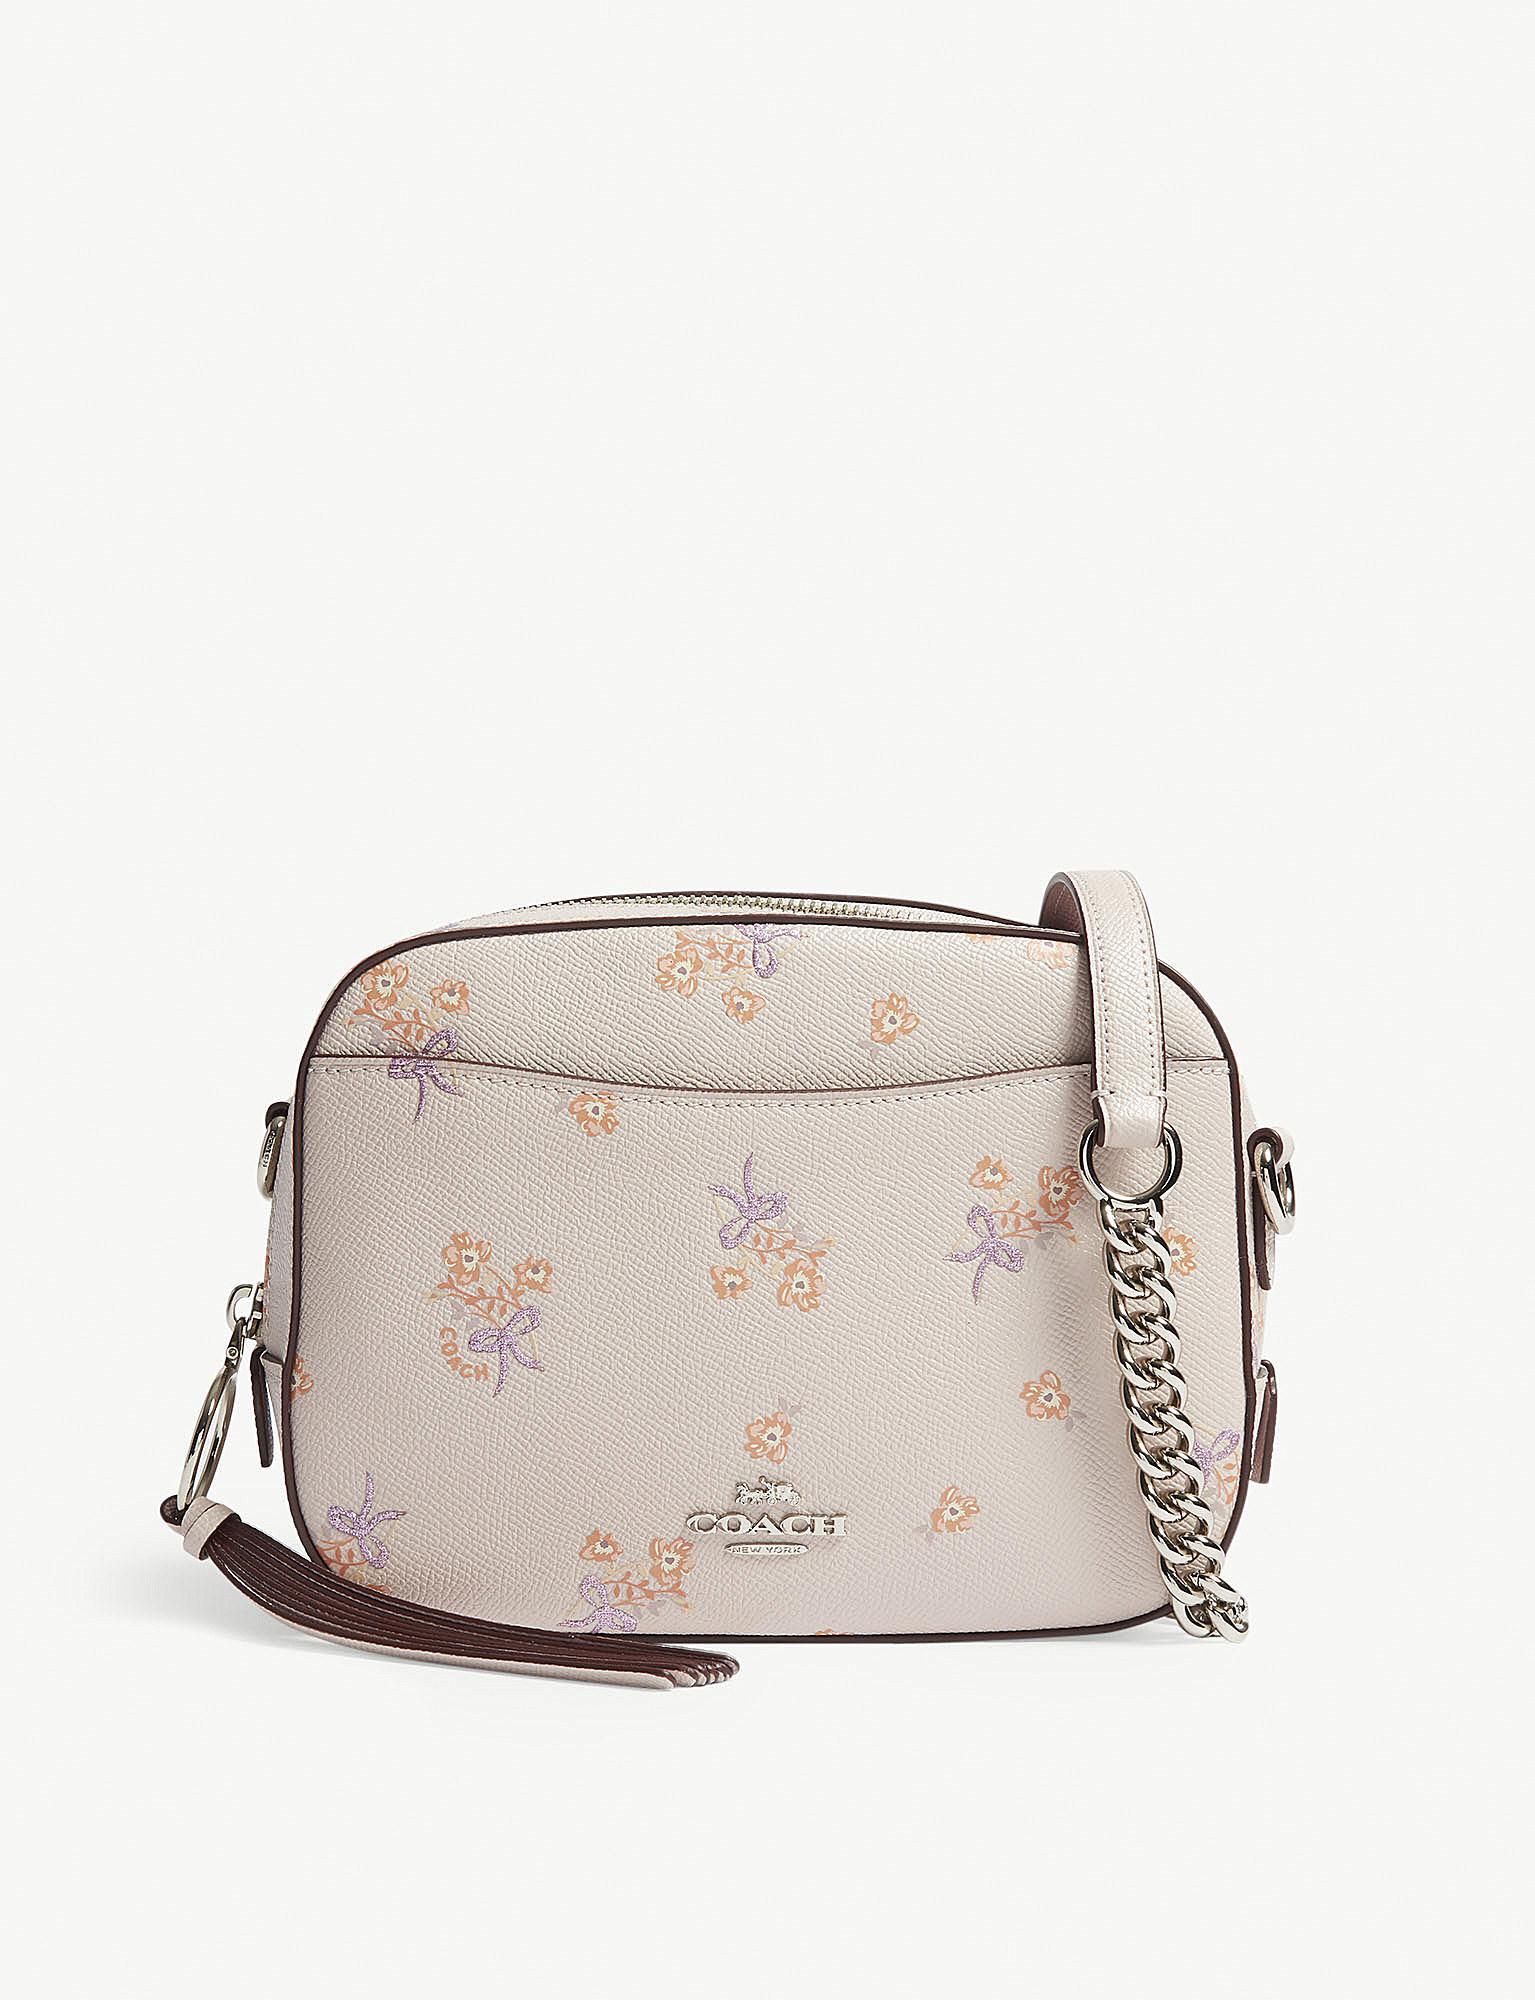 6c4cc8b3b3eb COACH. Women s Ladies Ice Pink Floral Elegant Leather Camera Cross-body Bag